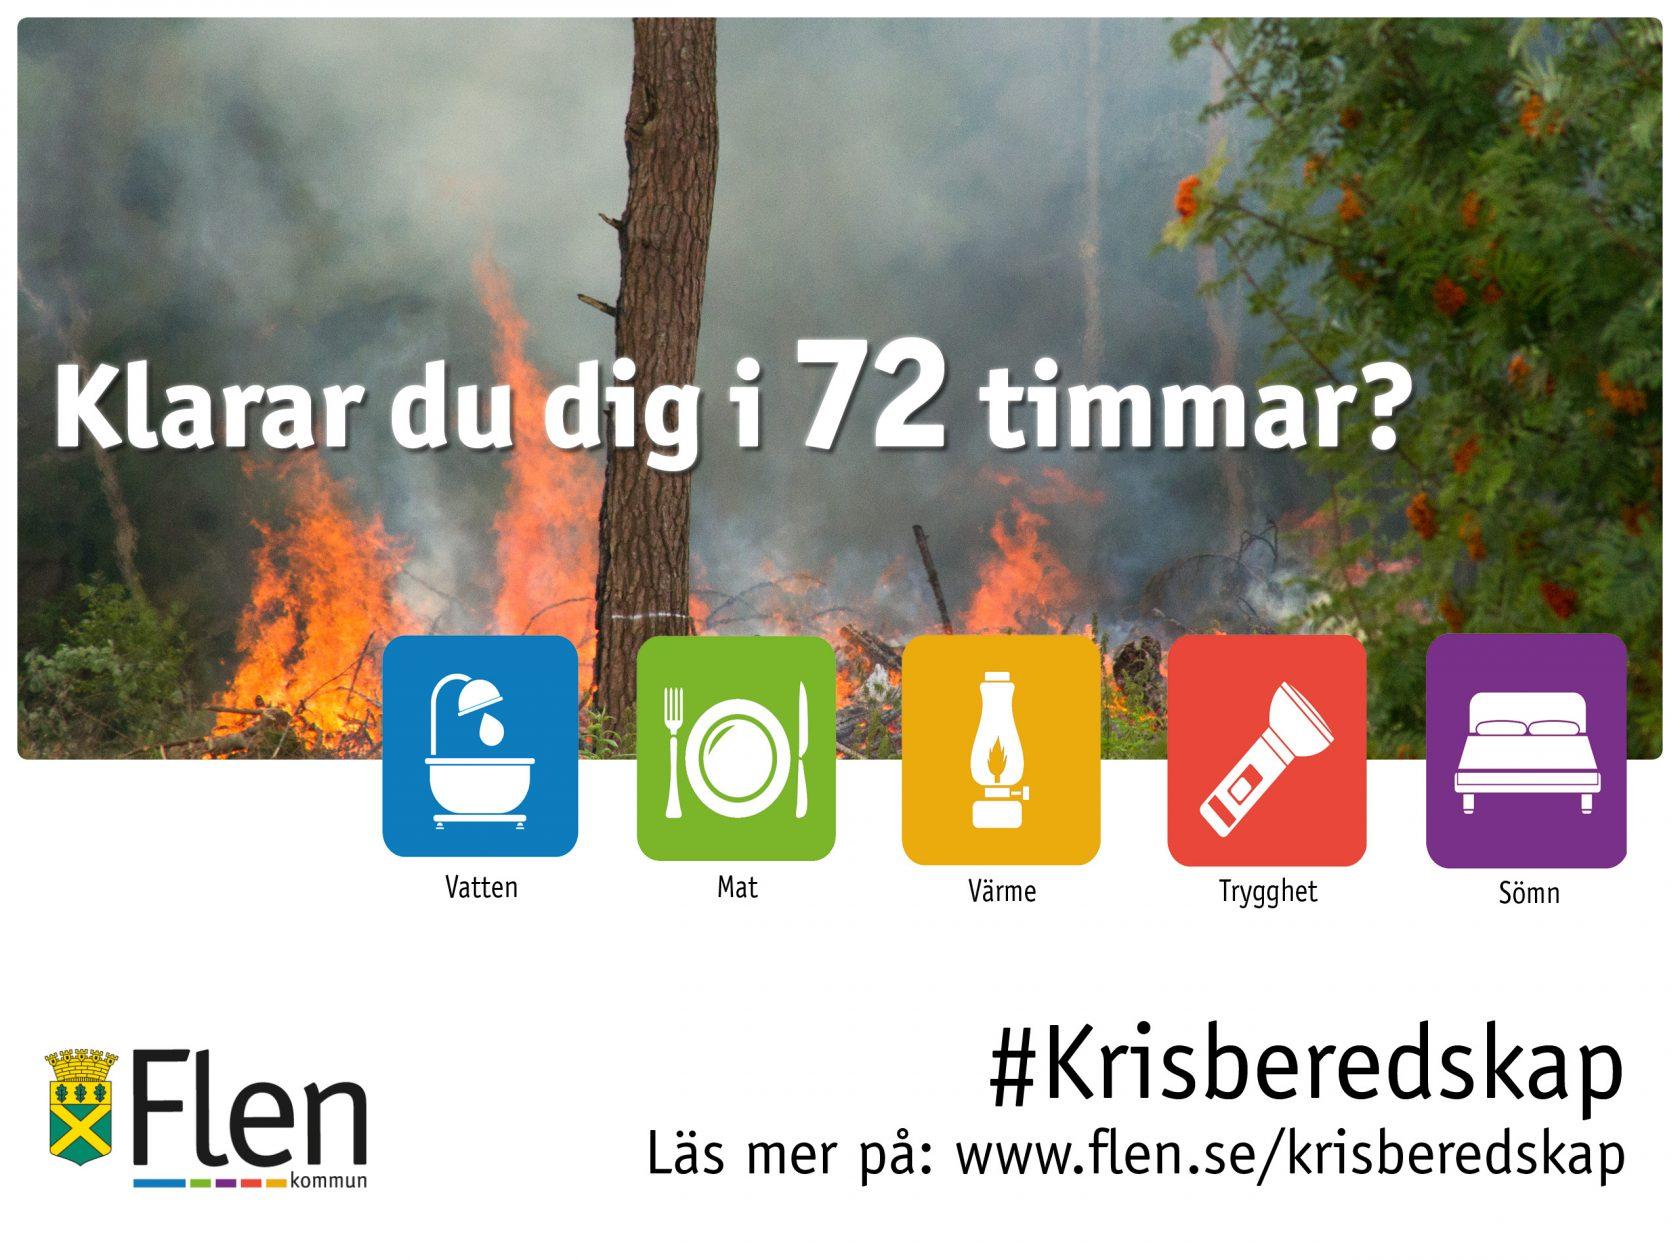 Brinnande skog - klarar du dig i 72 timmar? Krisberedskap